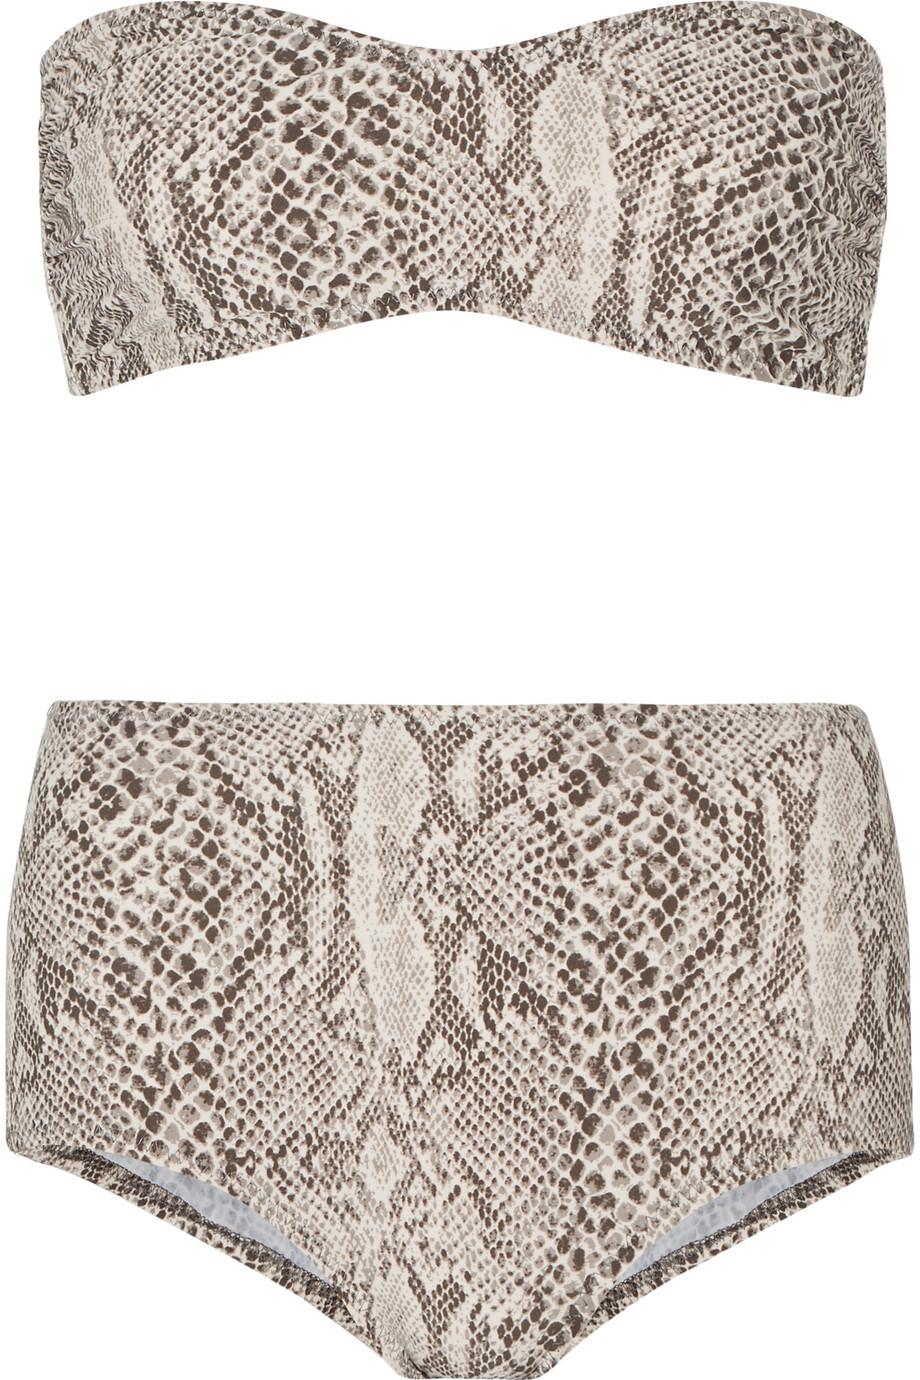 Norma Kamali Sunglass Snake-Print Bandeau Bikini, Snake Print/Beige, Women's, Size: M